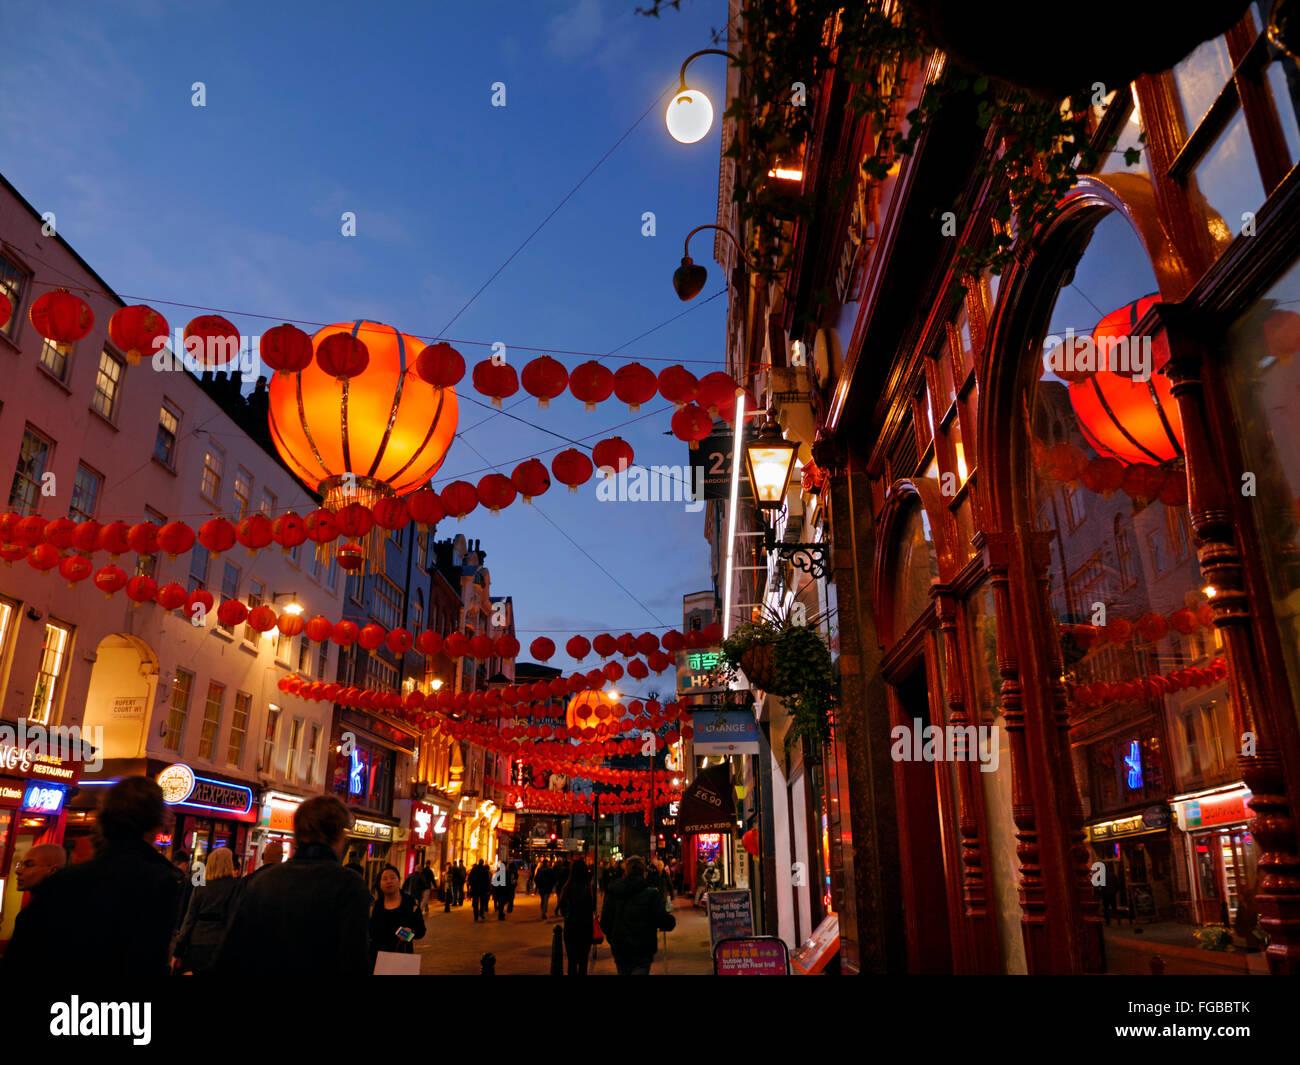 Chinese lanterns lit up on a busy night in Wardour Street Chinatown Soho London UK - Stock Image